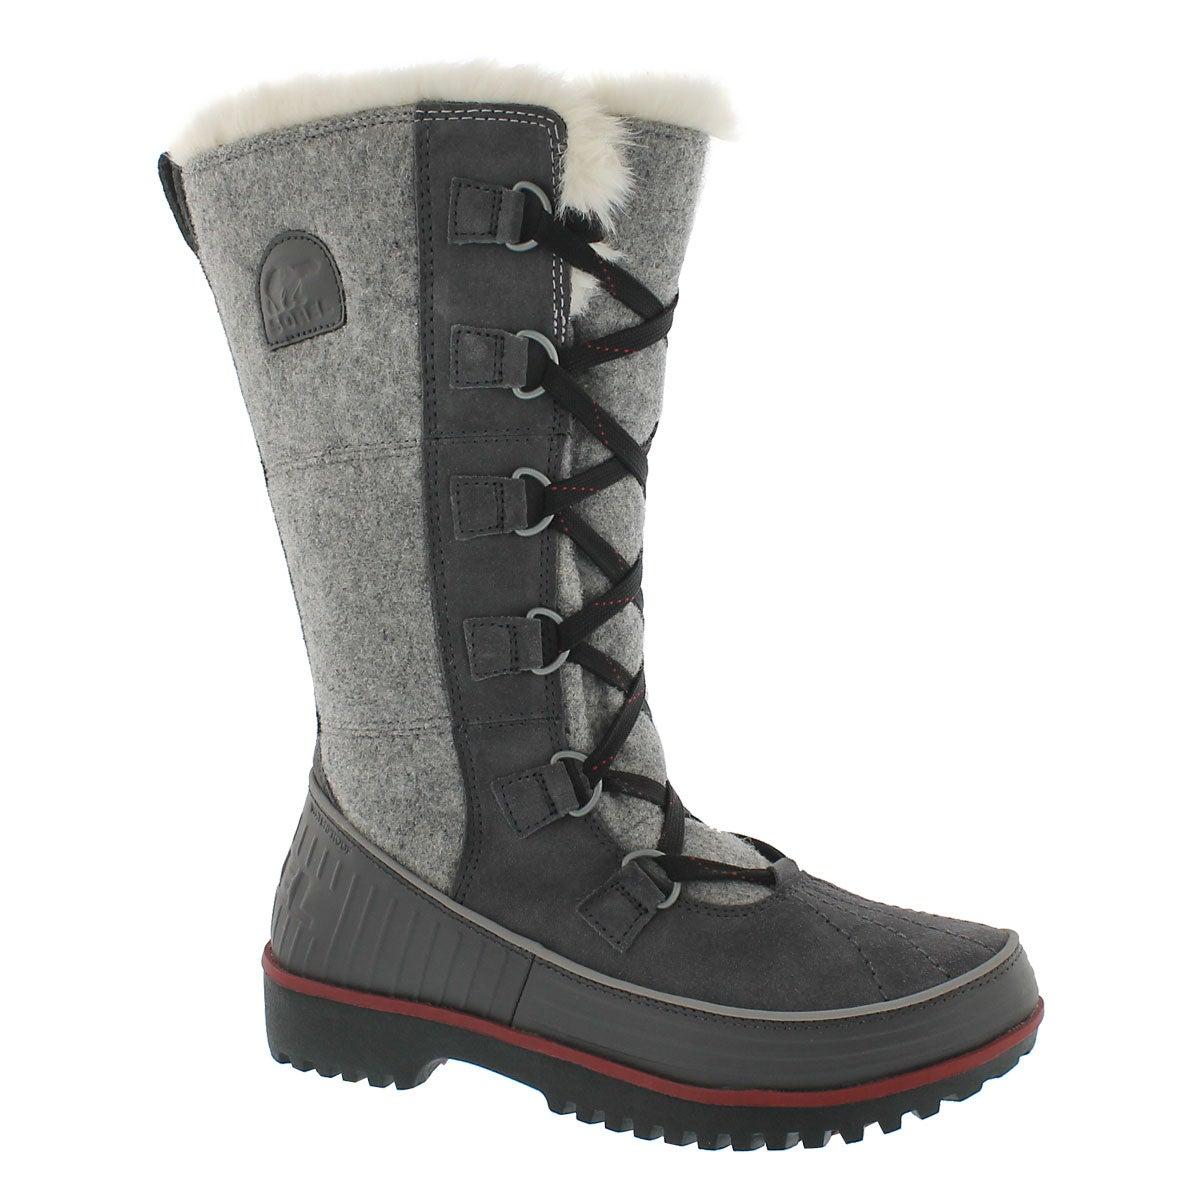 Women's TIVOLI HIGH II dark grey winter boots